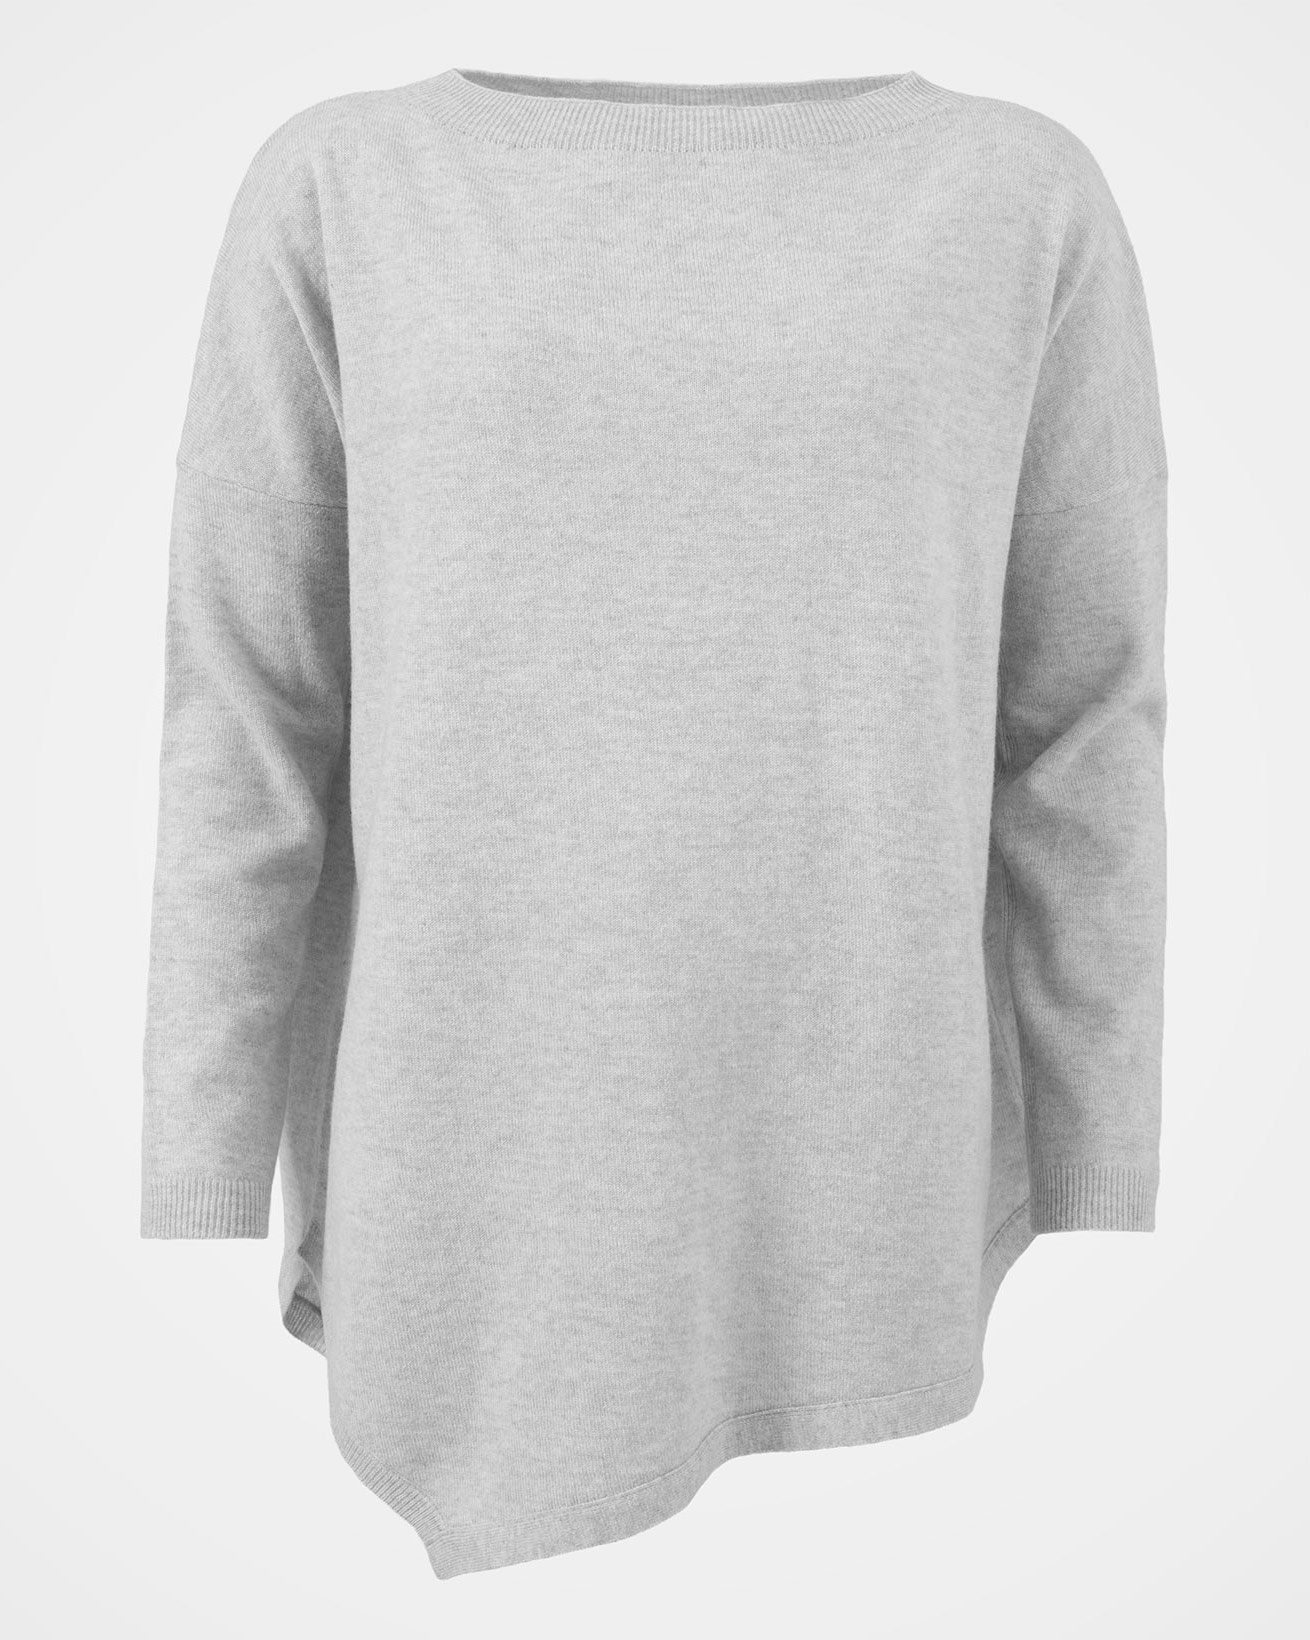 Geelong Asymetric Tunic - Size Medium - Pearl Grey - 1547